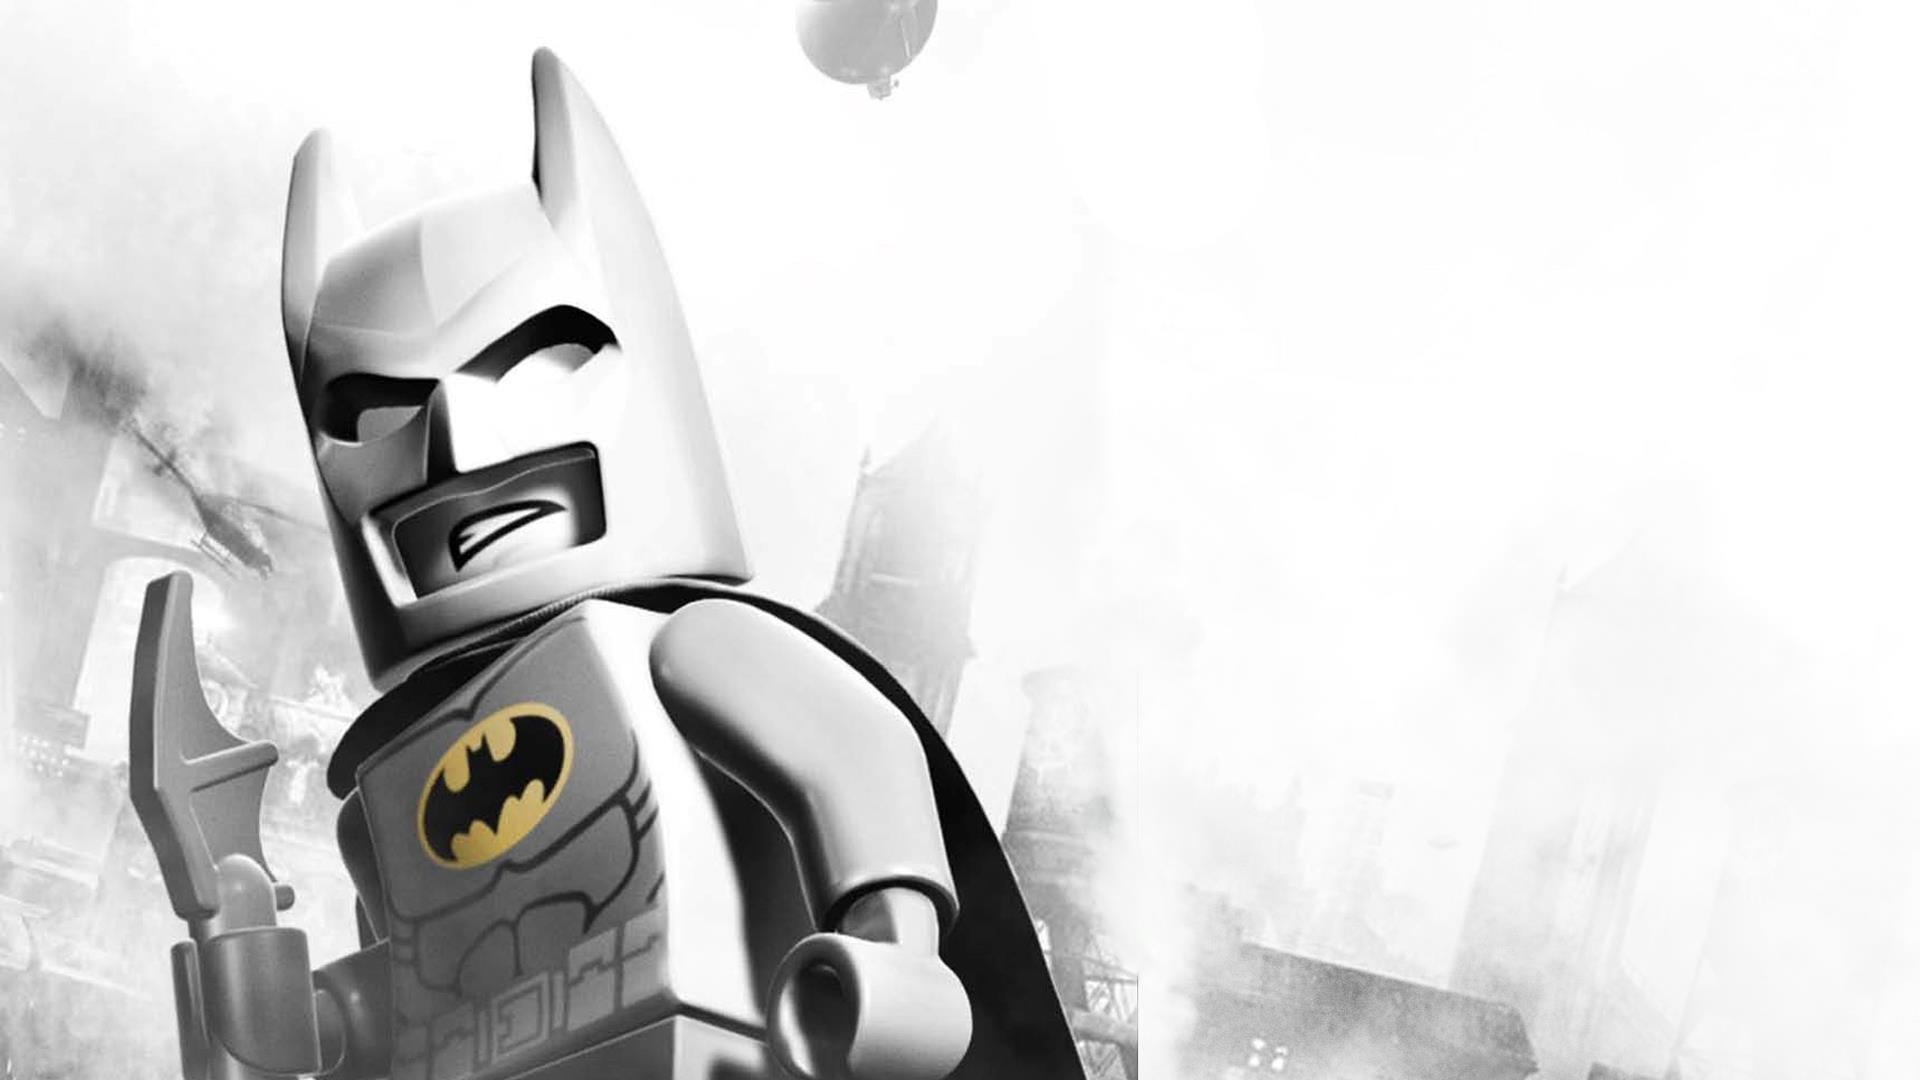 lego batman 2 wallpaper flash - photo #25